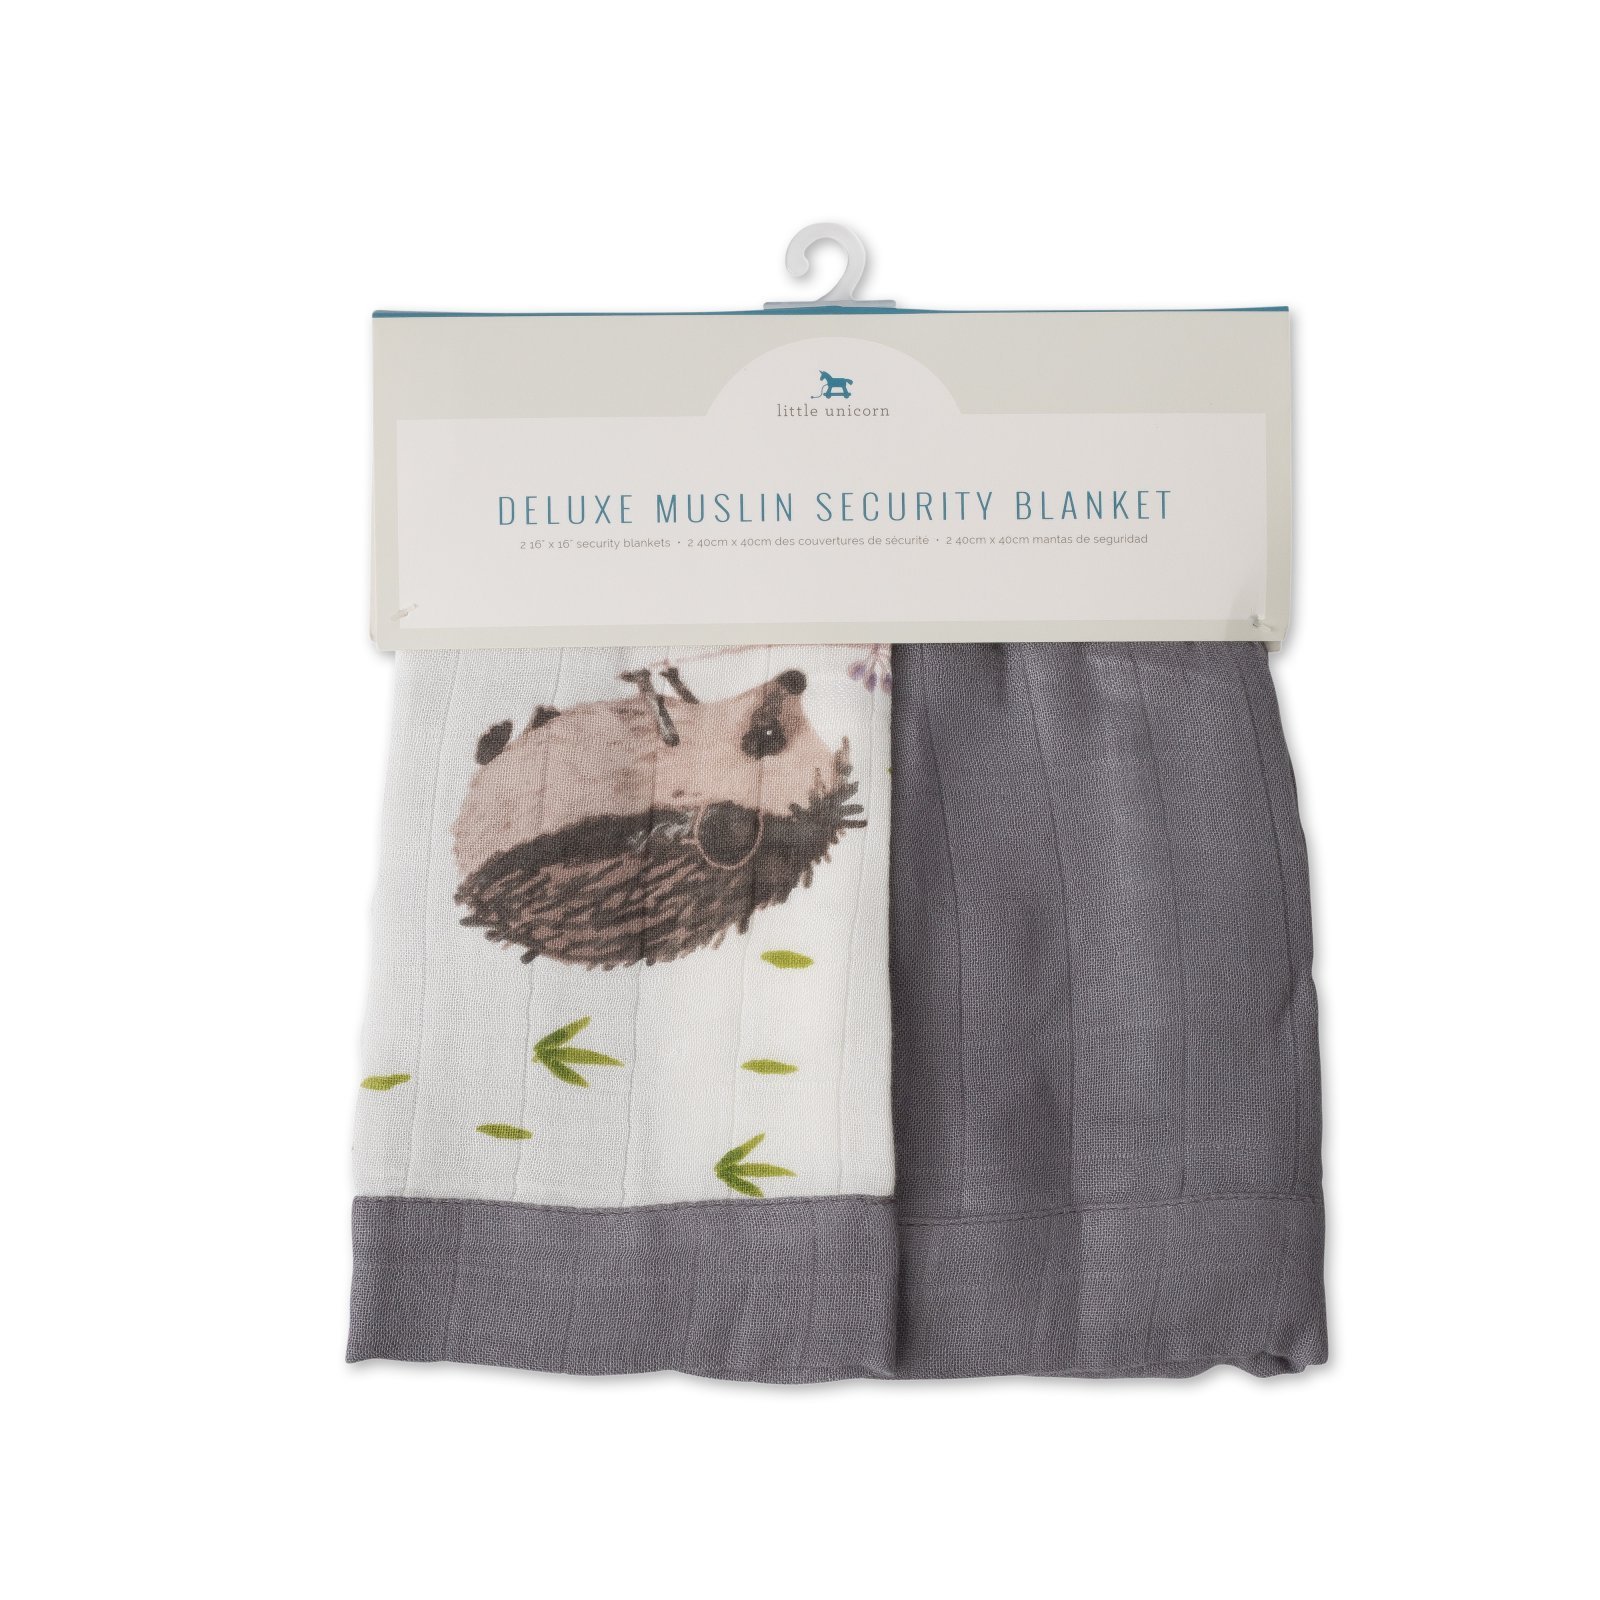 Little Unicorn Deluxe Muslin Security Blanket 2 Pack - Hedgehog + Charcoal